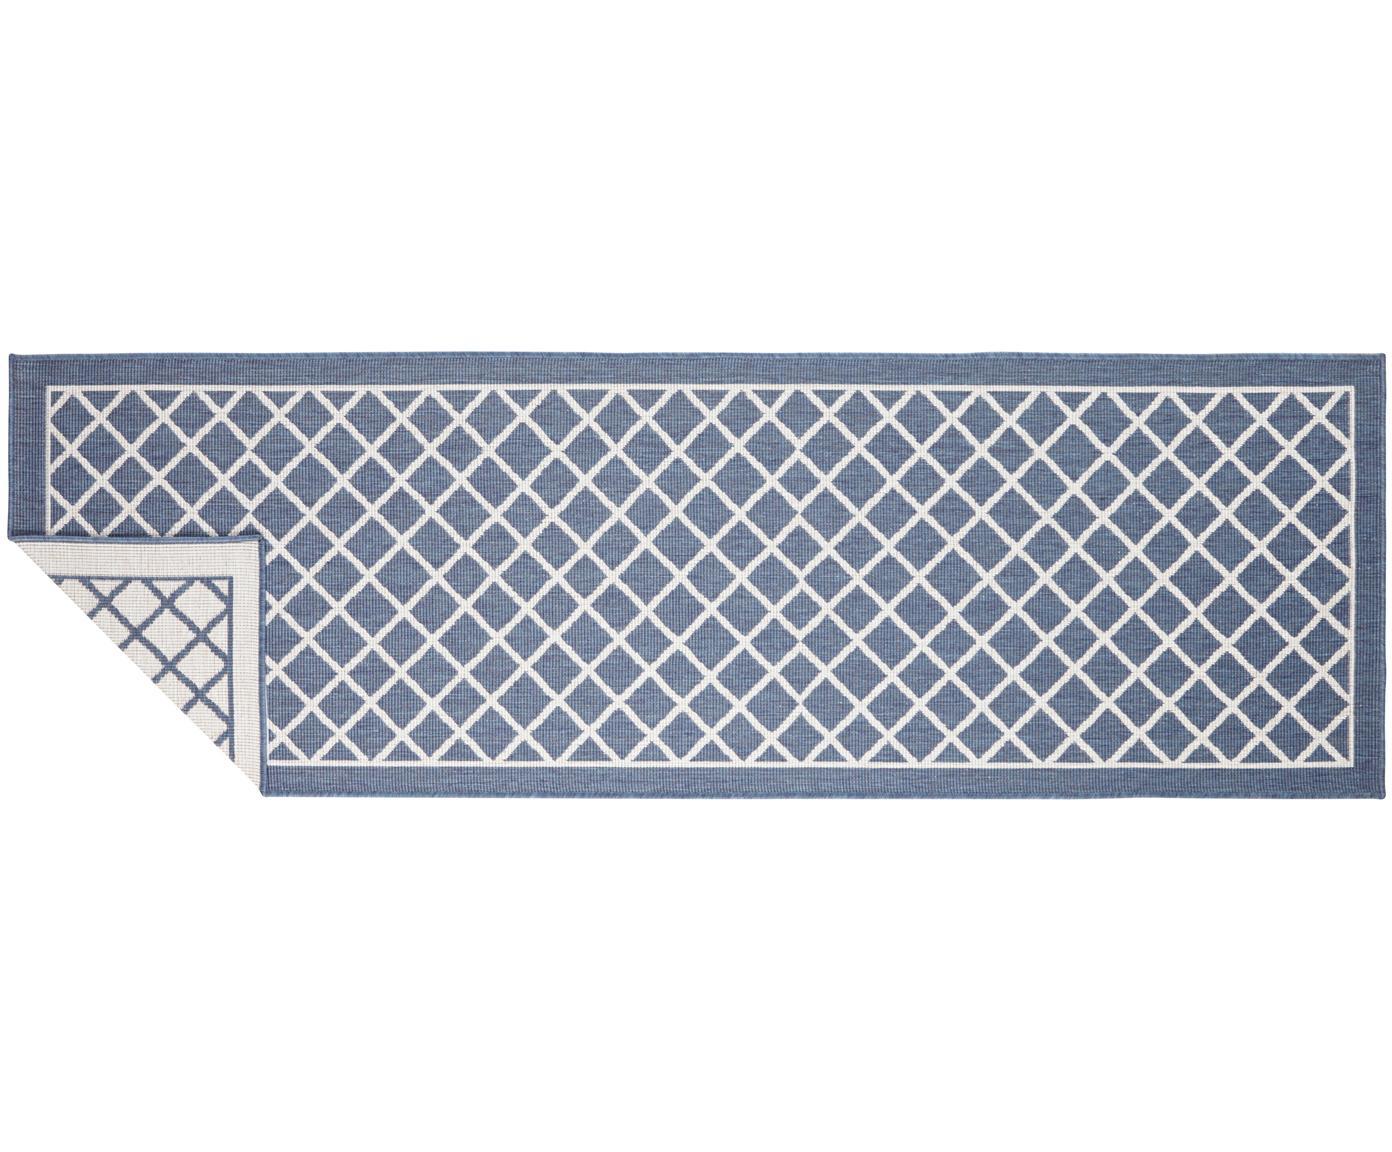 Passatoia reversibile per interni ed esterni Sydney, Blu, crema, P 80 x L 250 cm